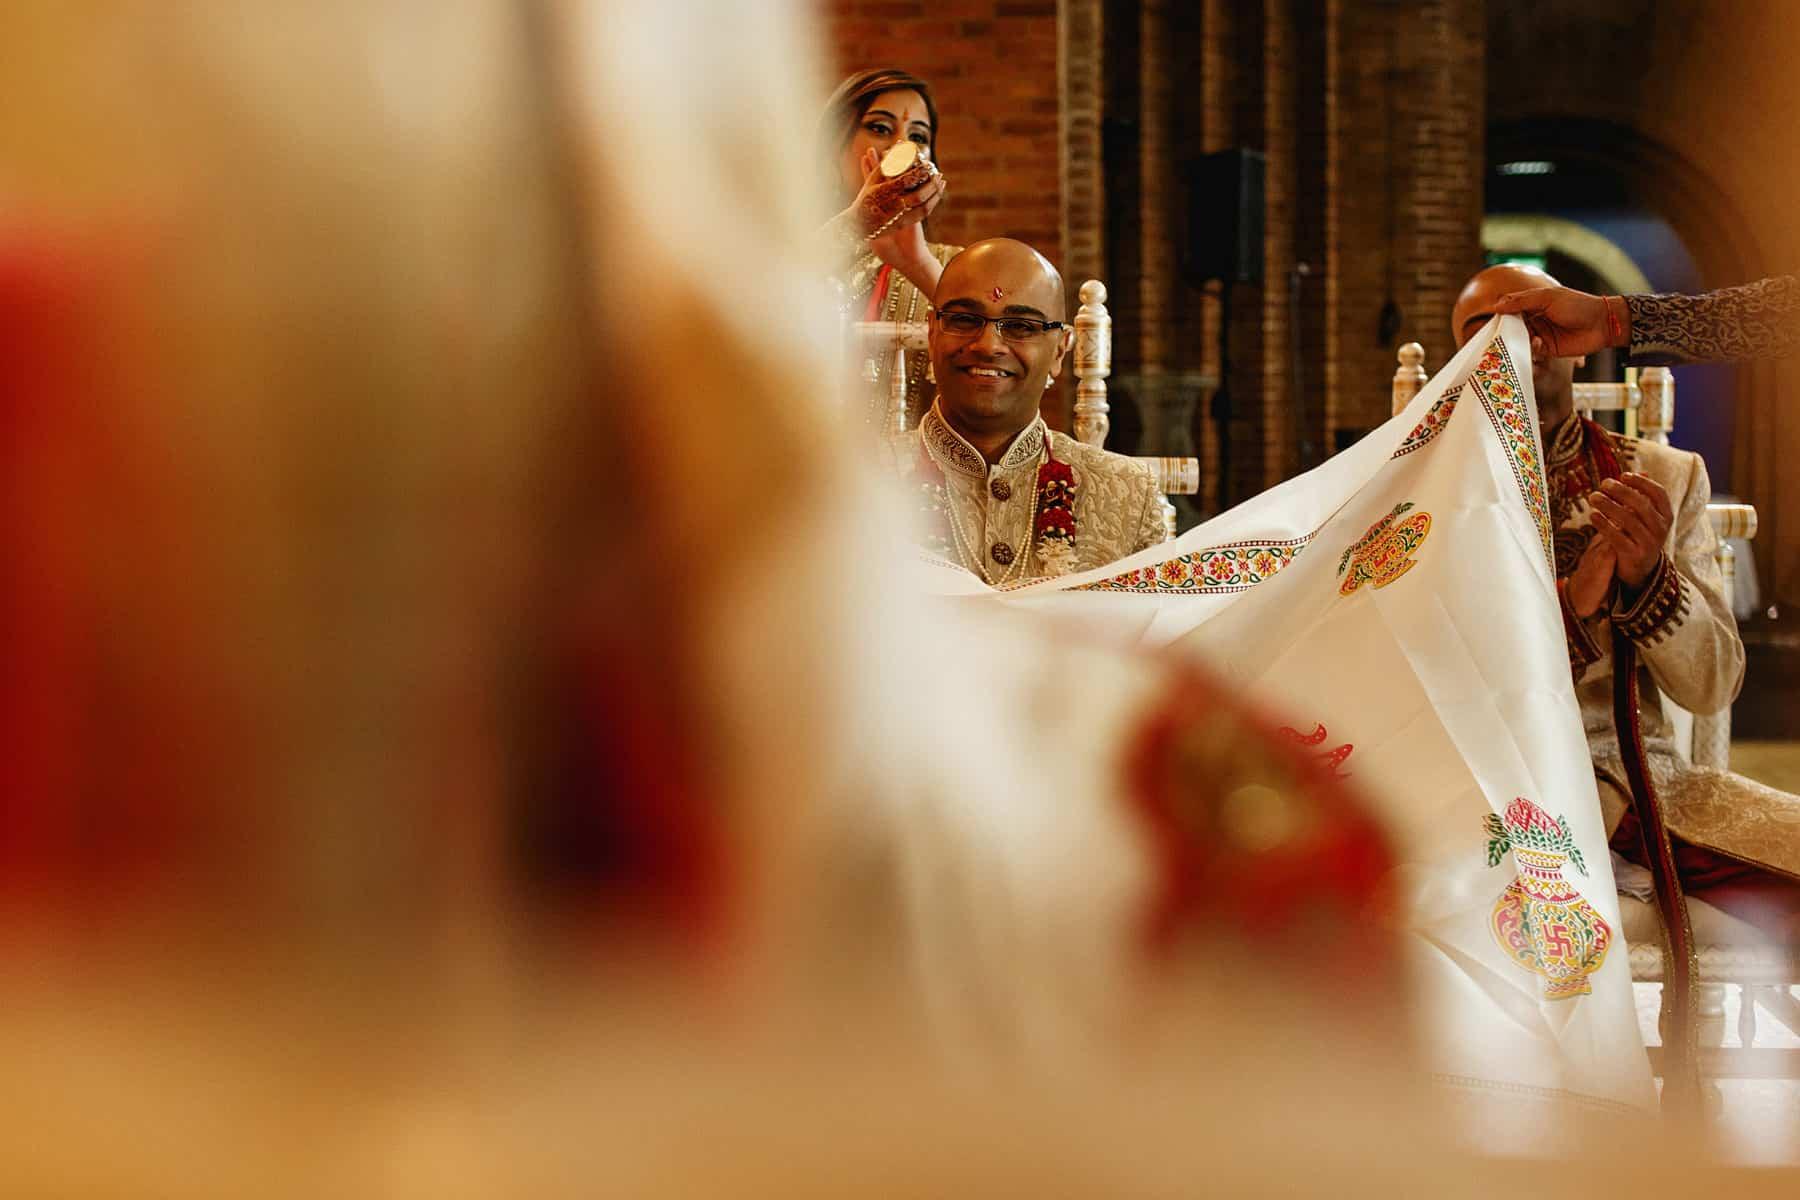 kelham hall hindu wedding